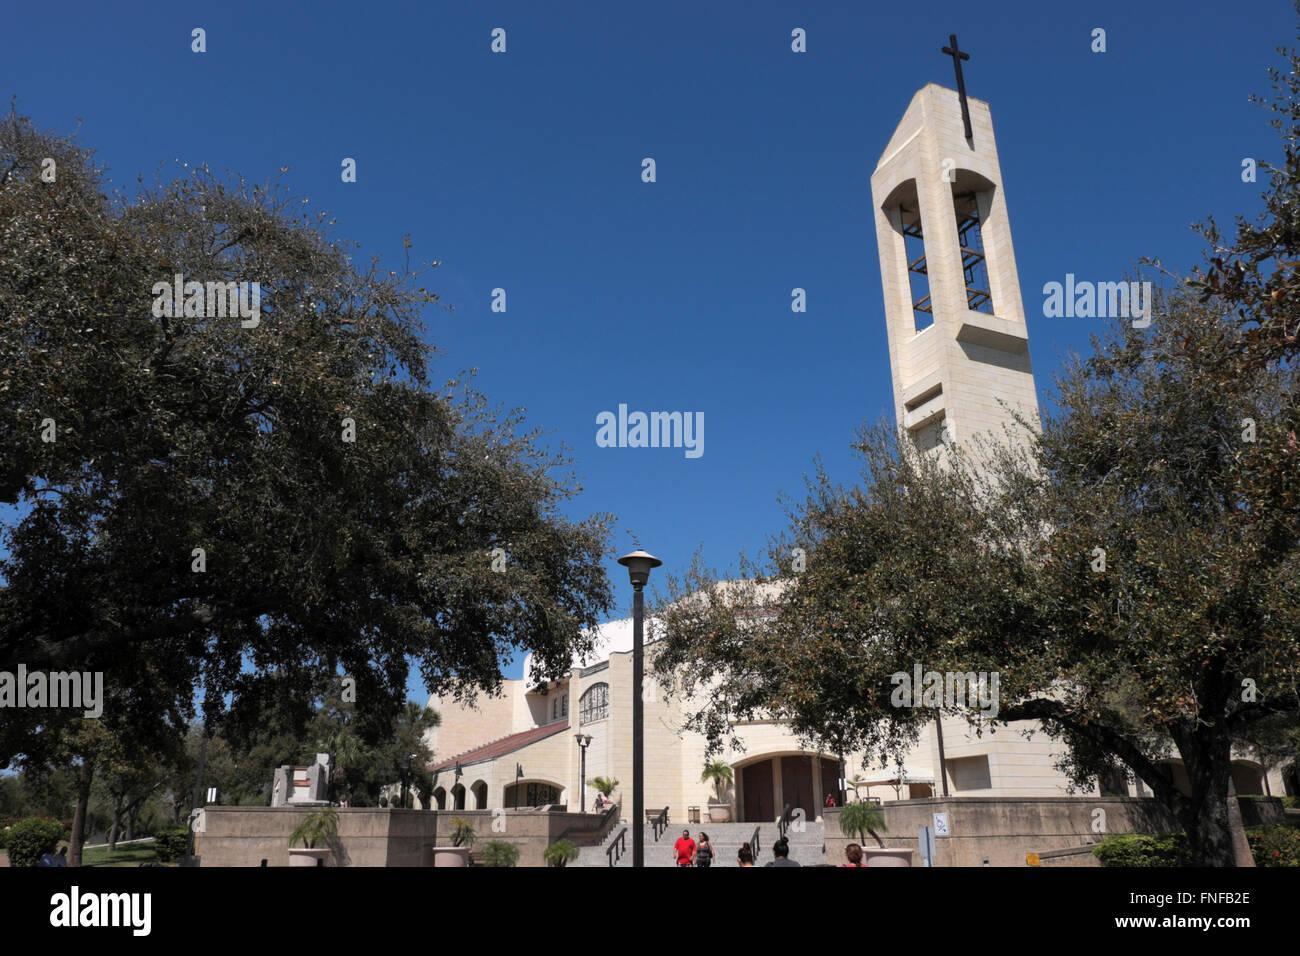 Basilica of our lady of san juan del valle national shrine at san juan texas usa